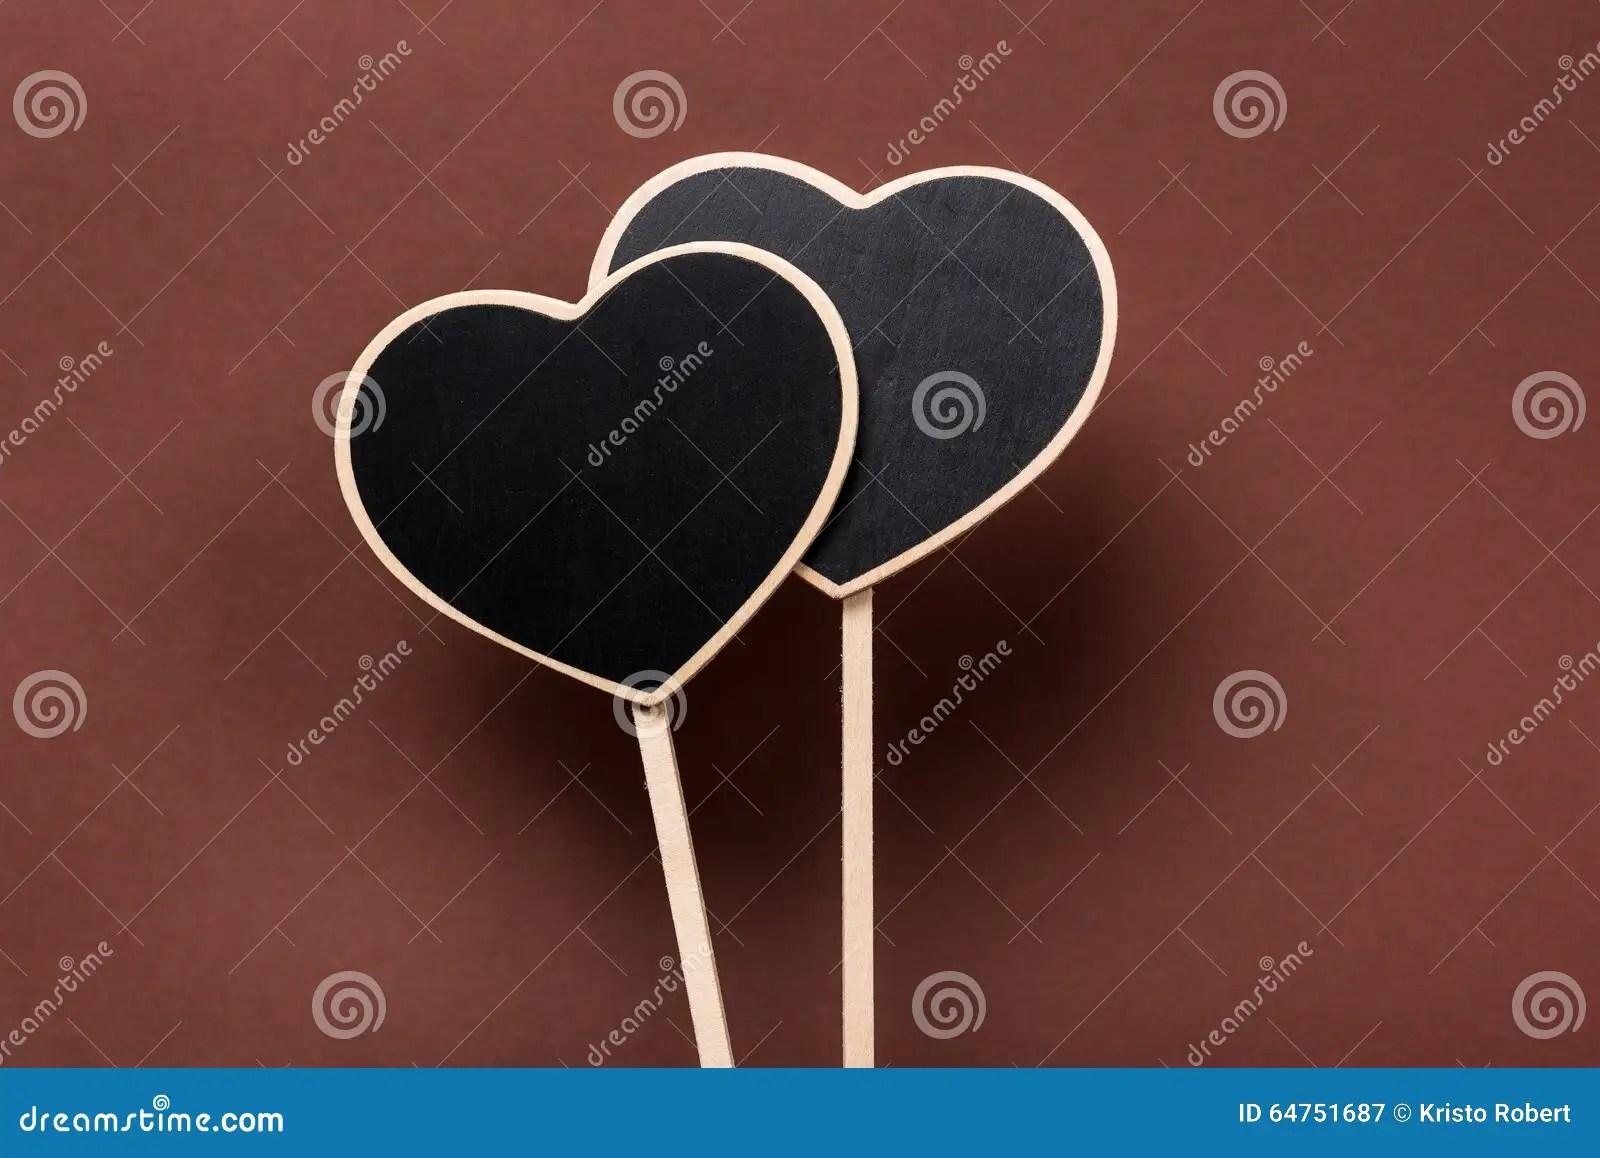 Heart Label Stock Photo